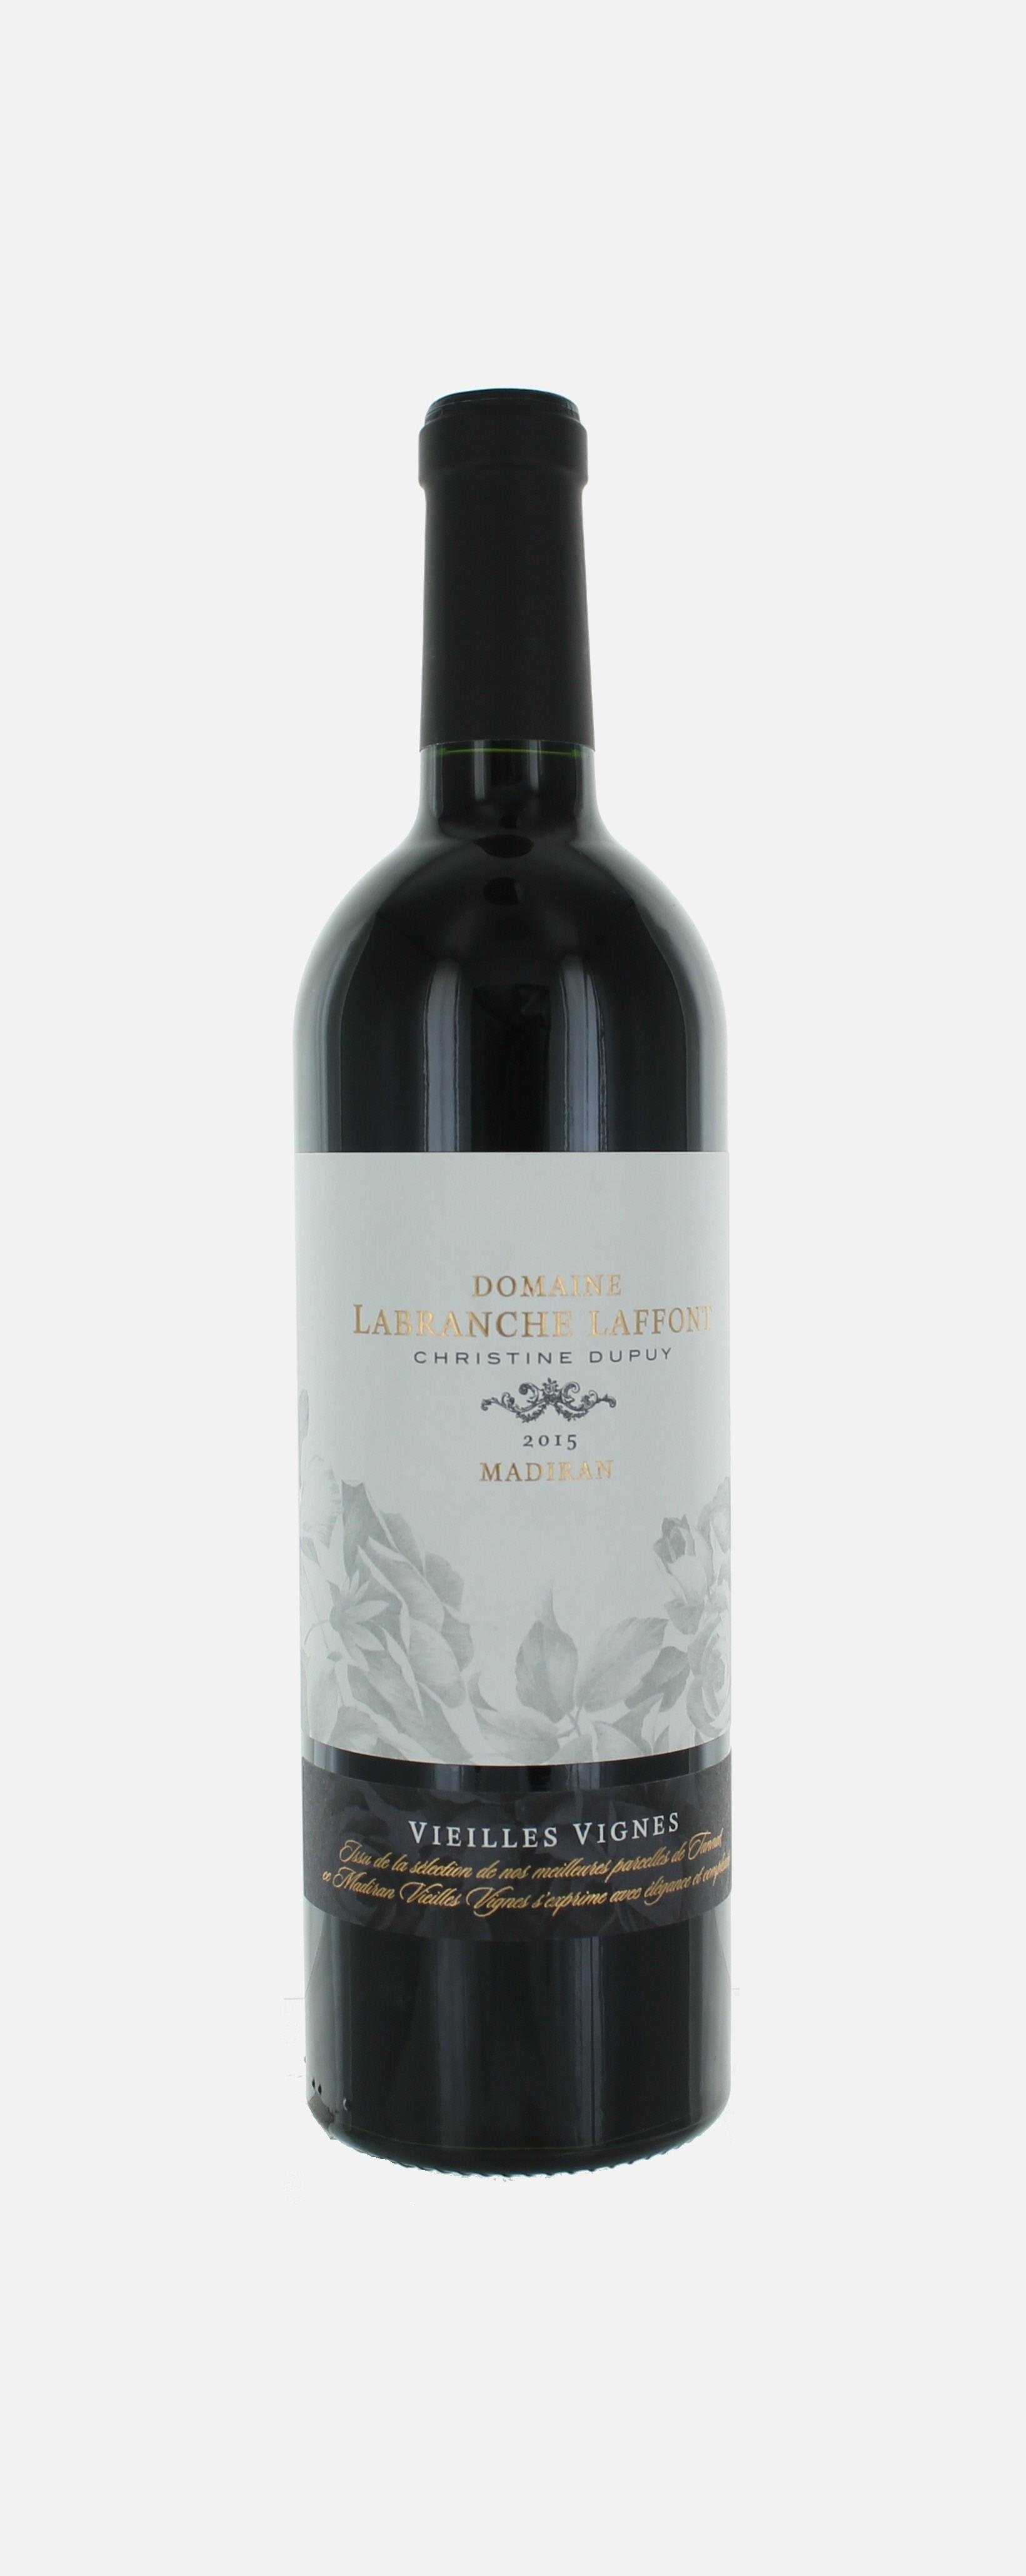 Madiran vieilles vignes, Labranche-Lafont